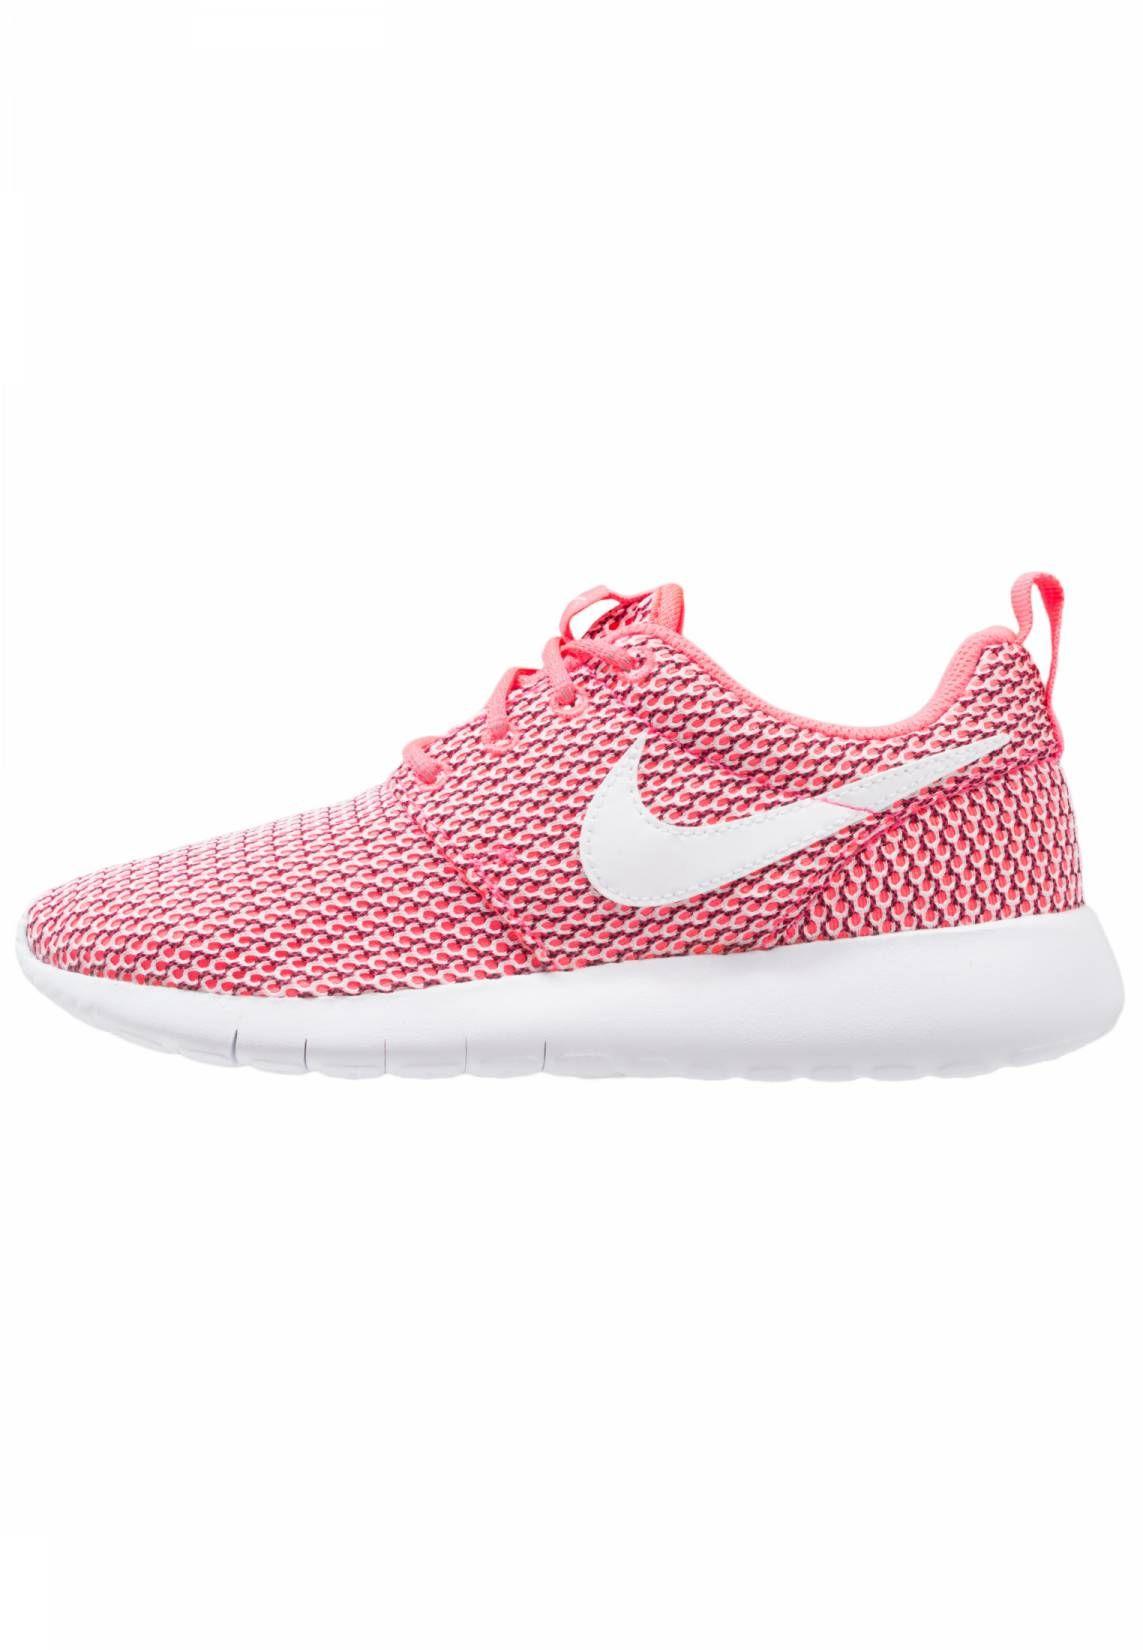 hada carbón Vacilar  Nike Sportswear. ROSHE ONE - Zapatillas - racer pink/white/black.  Suela:fibra sintética. Plantilla:… | Zapatillas de niñas, Tipos de  zapatillas, Ropa deportiva nike